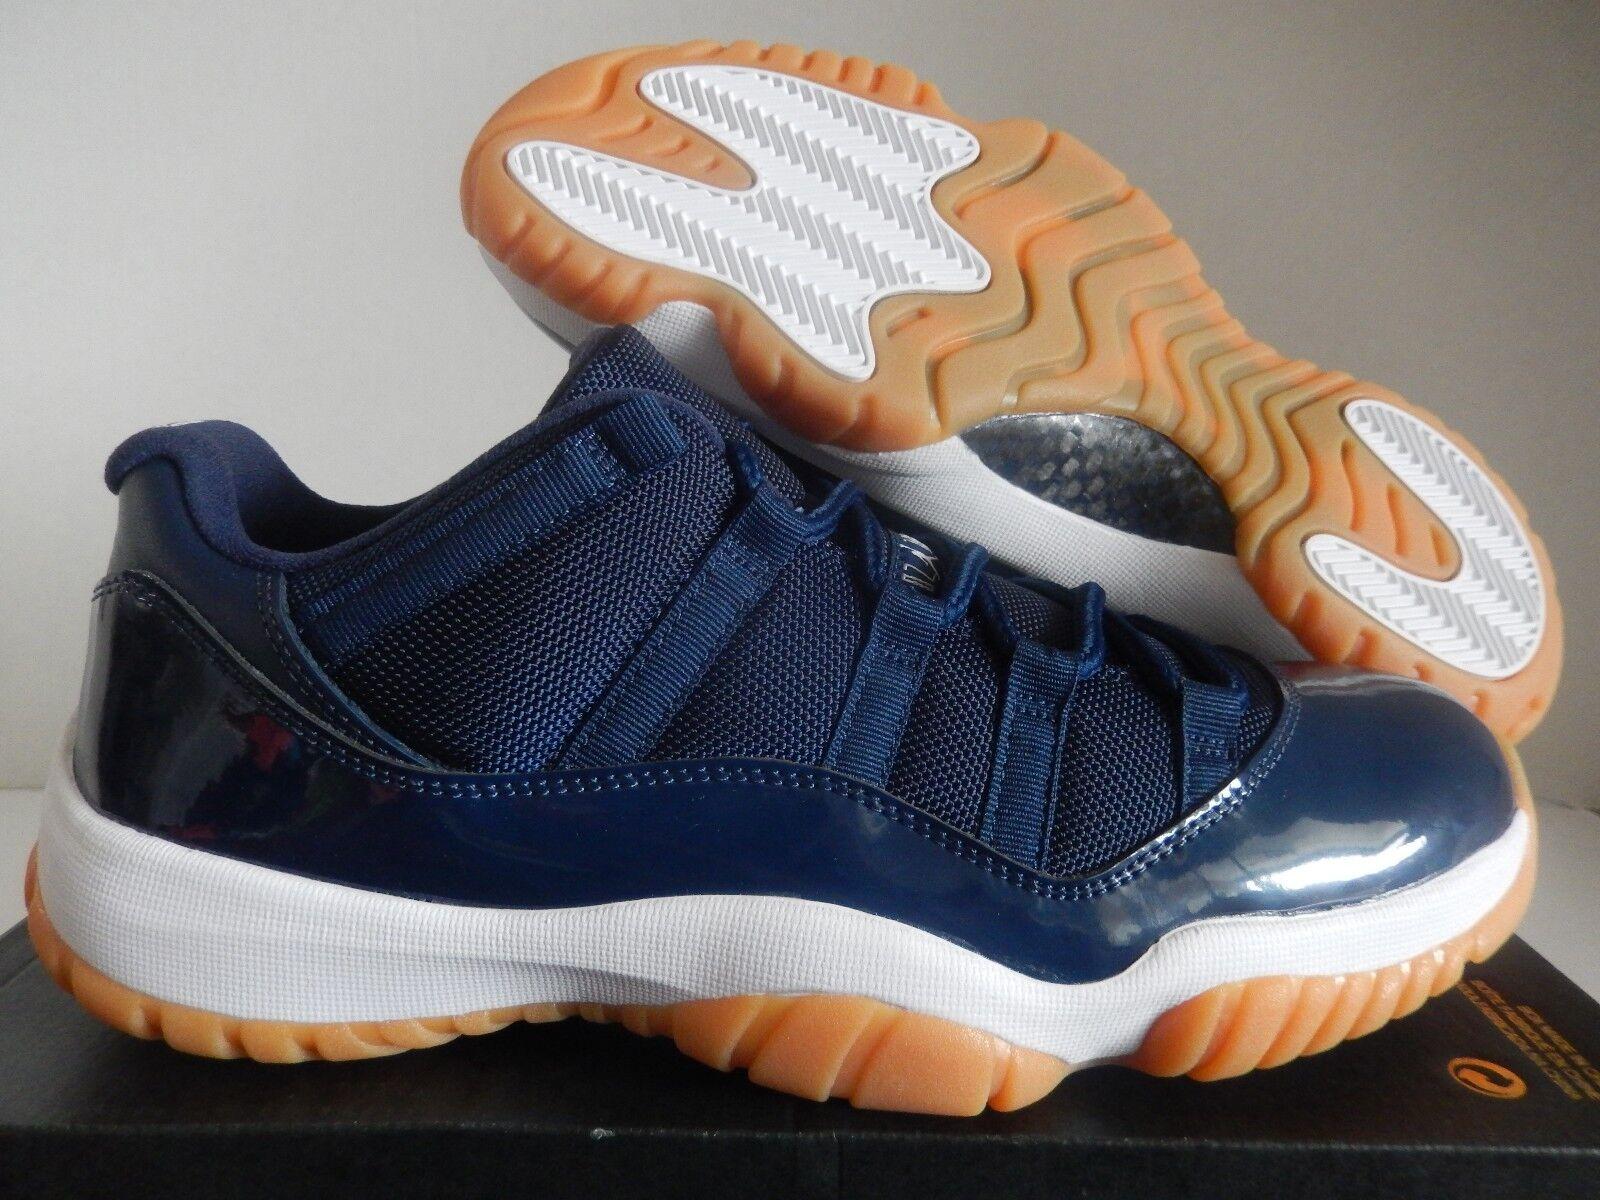 Nike marino Air Jordan 11 Retro Low azul marino Nike noche AzulGoma Marrón [528895405] 530482